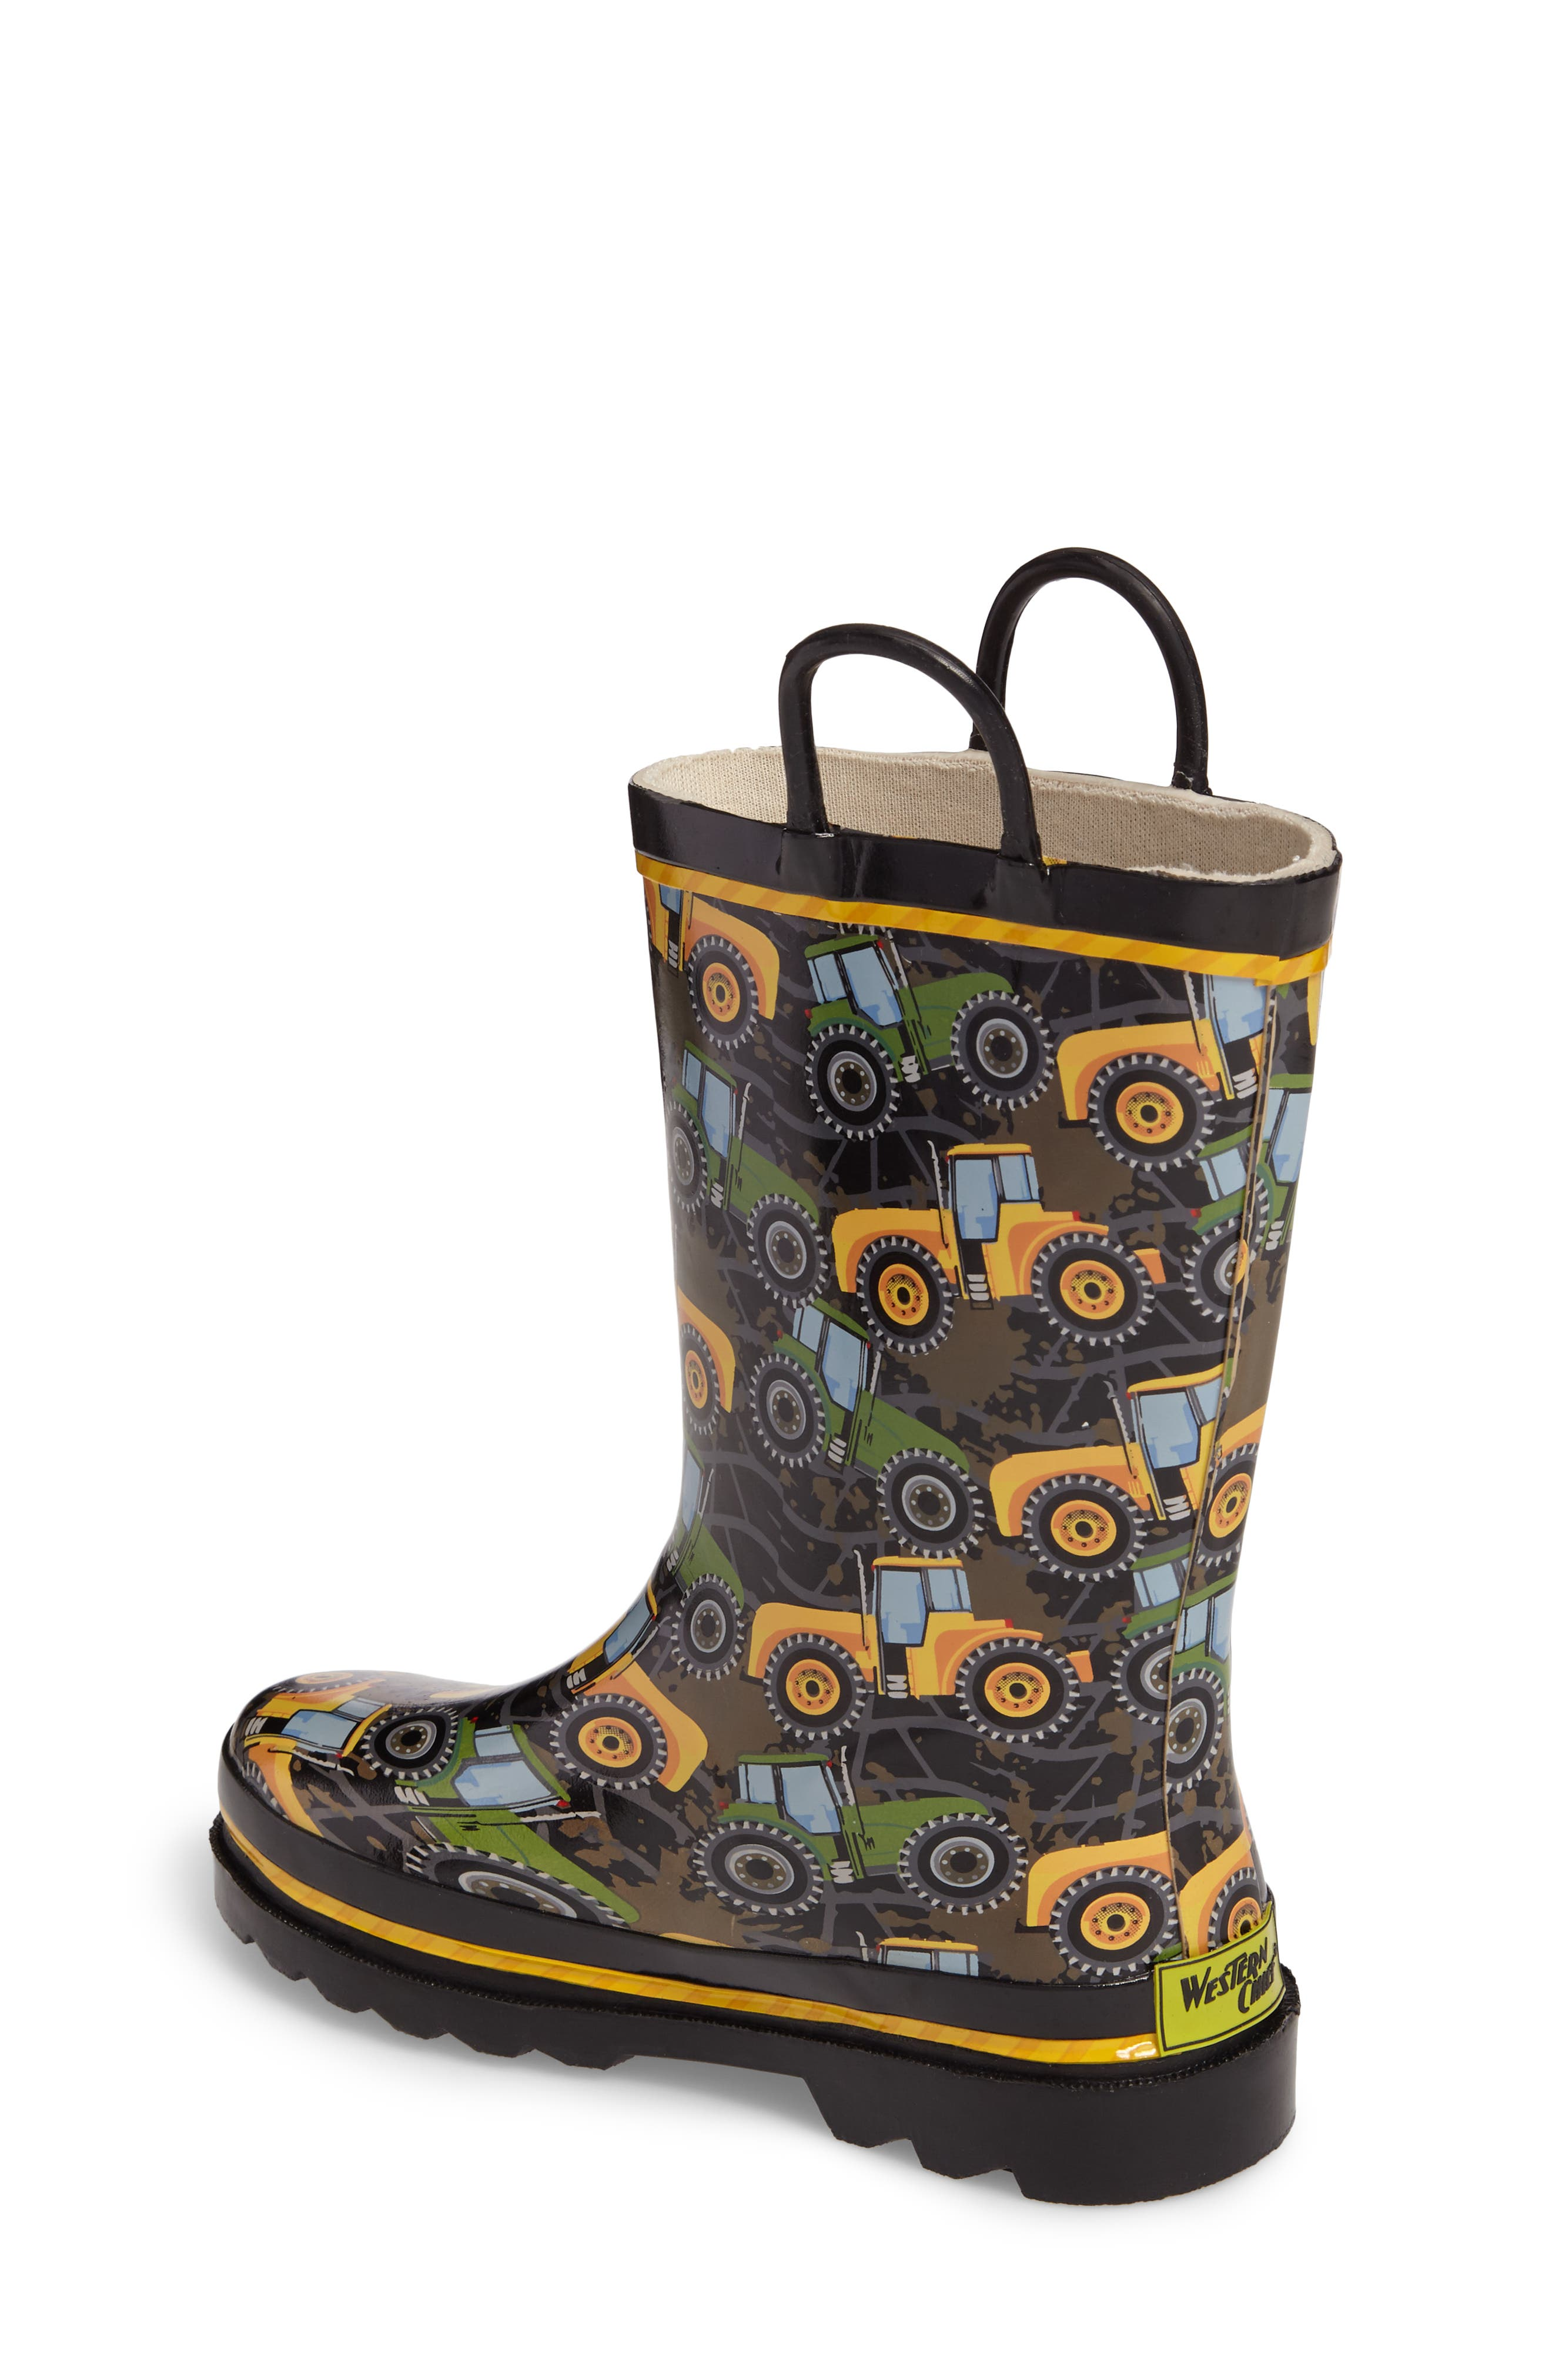 Tractor Tough Rain Boot,                             Alternate thumbnail 2, color,                             001